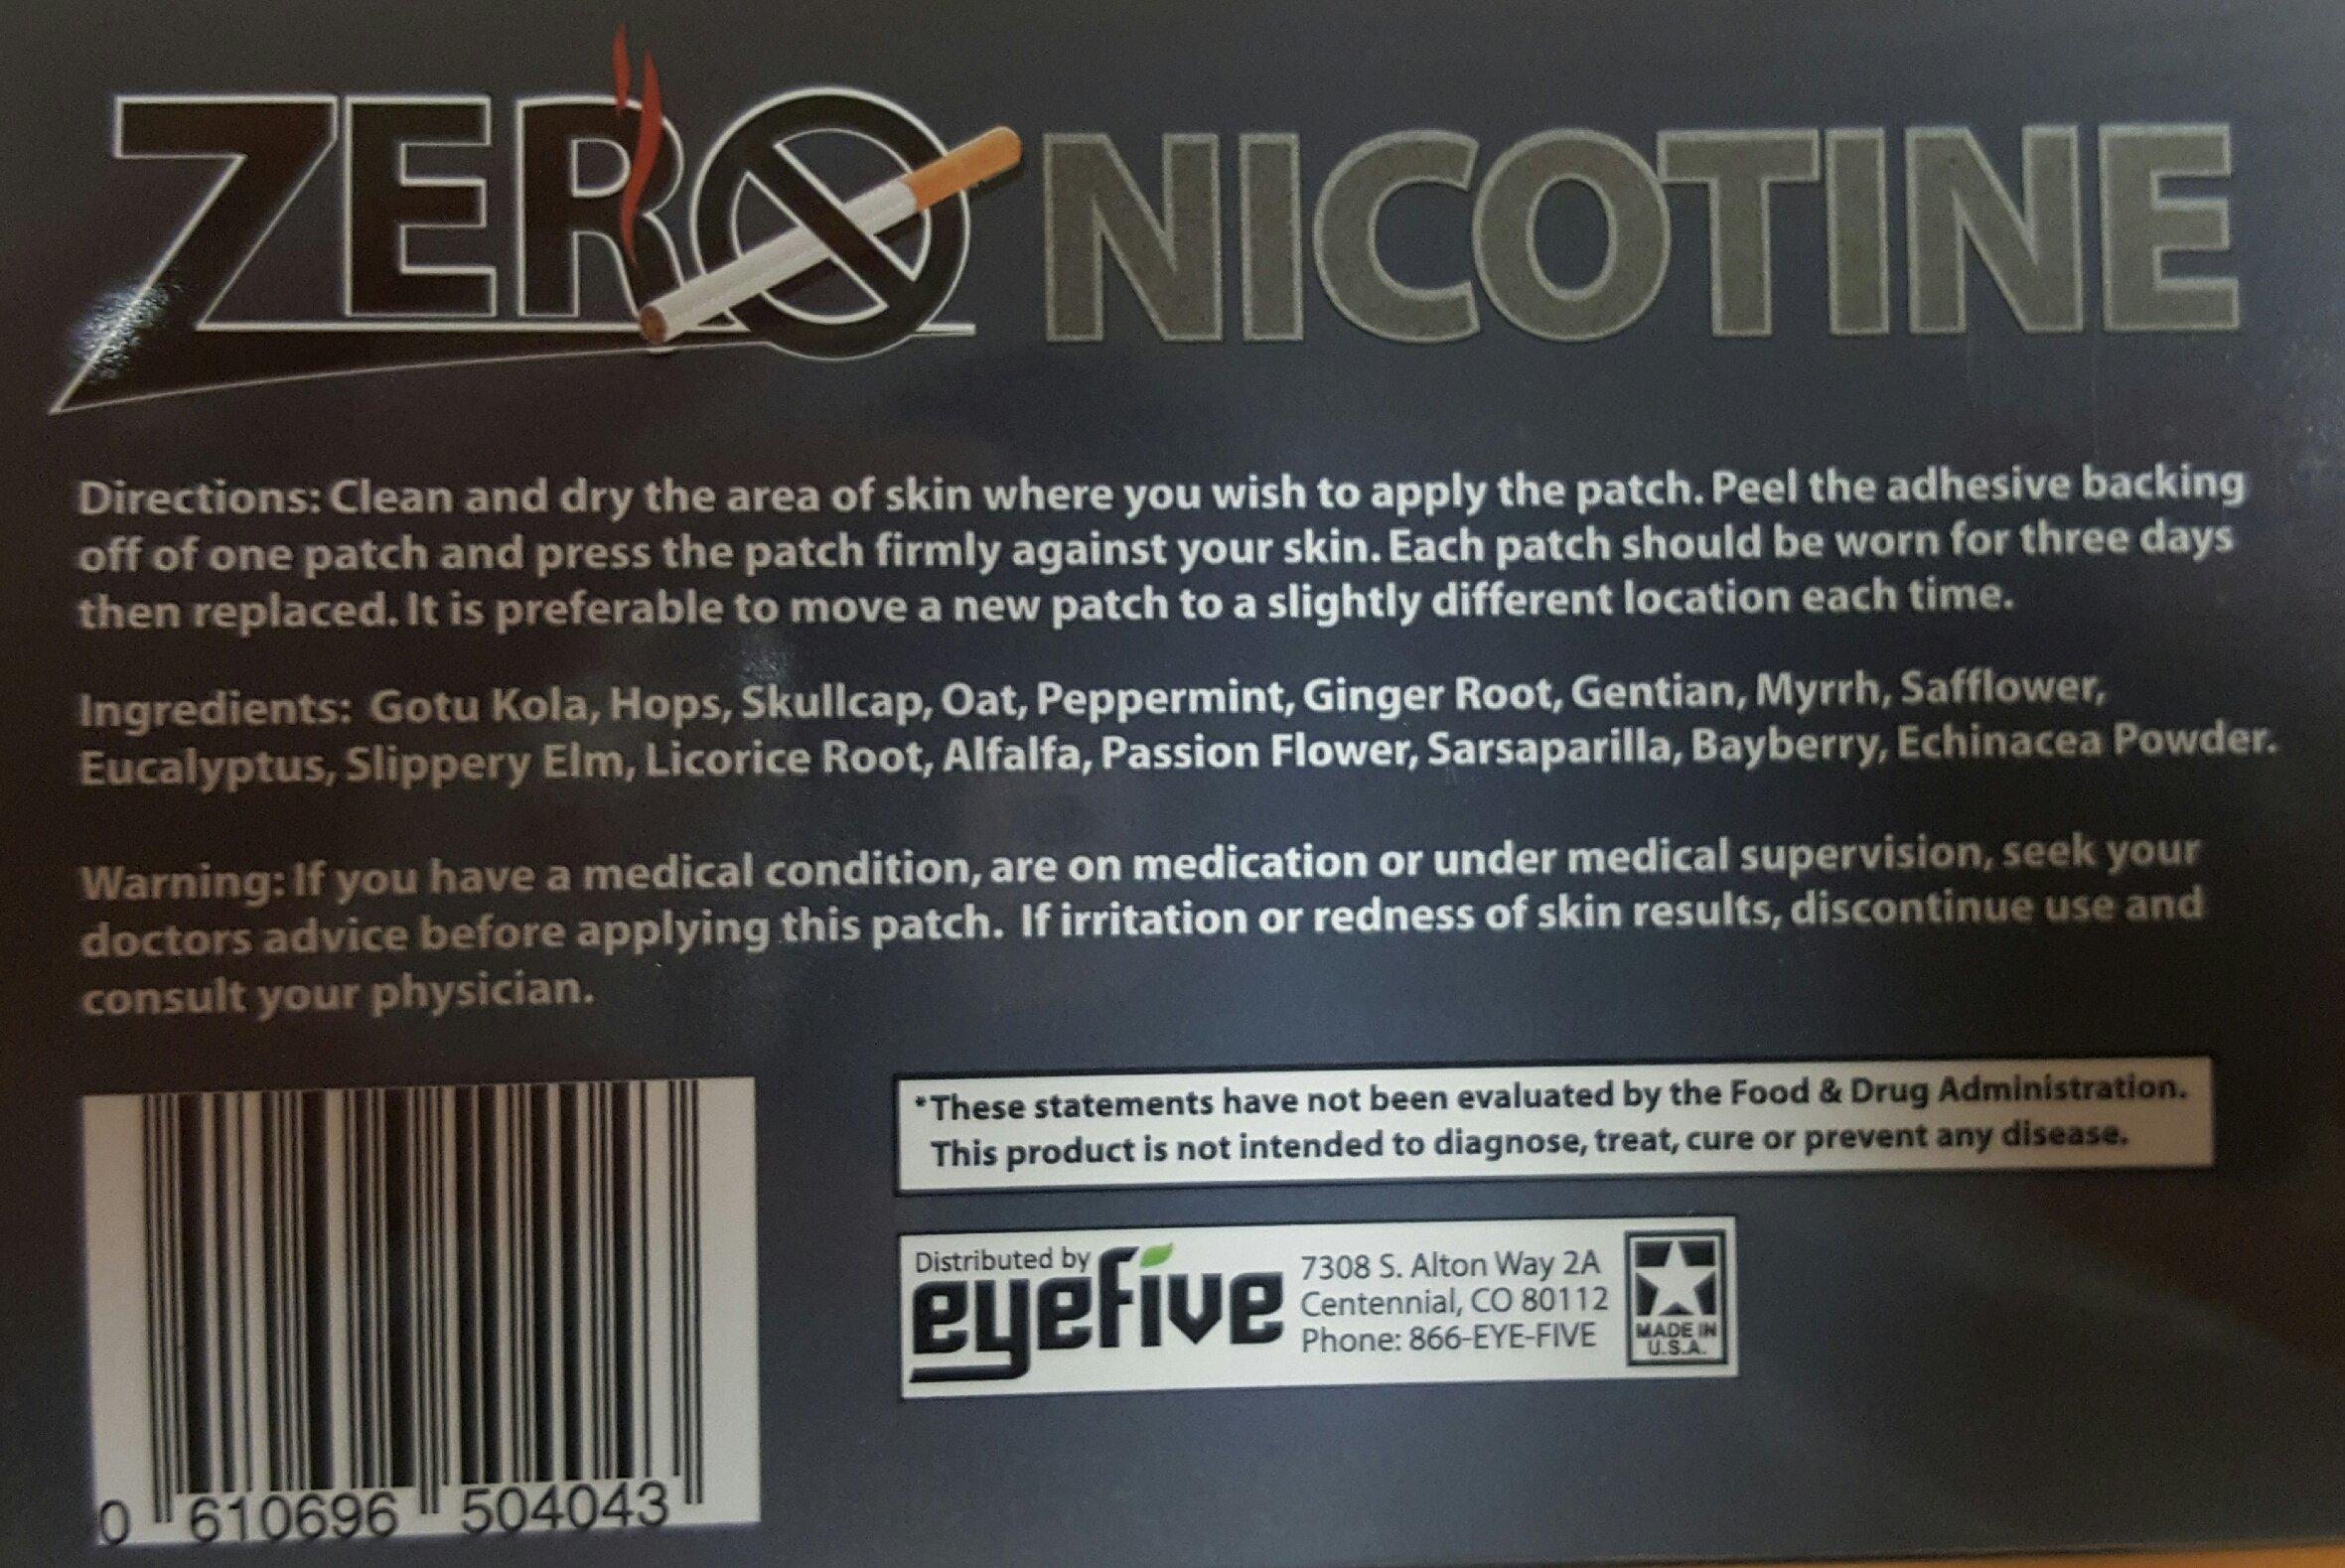 Zero Nicotine Patches - Kick the Nicotine Habit Naturally, 10 patches,(EyeFive)